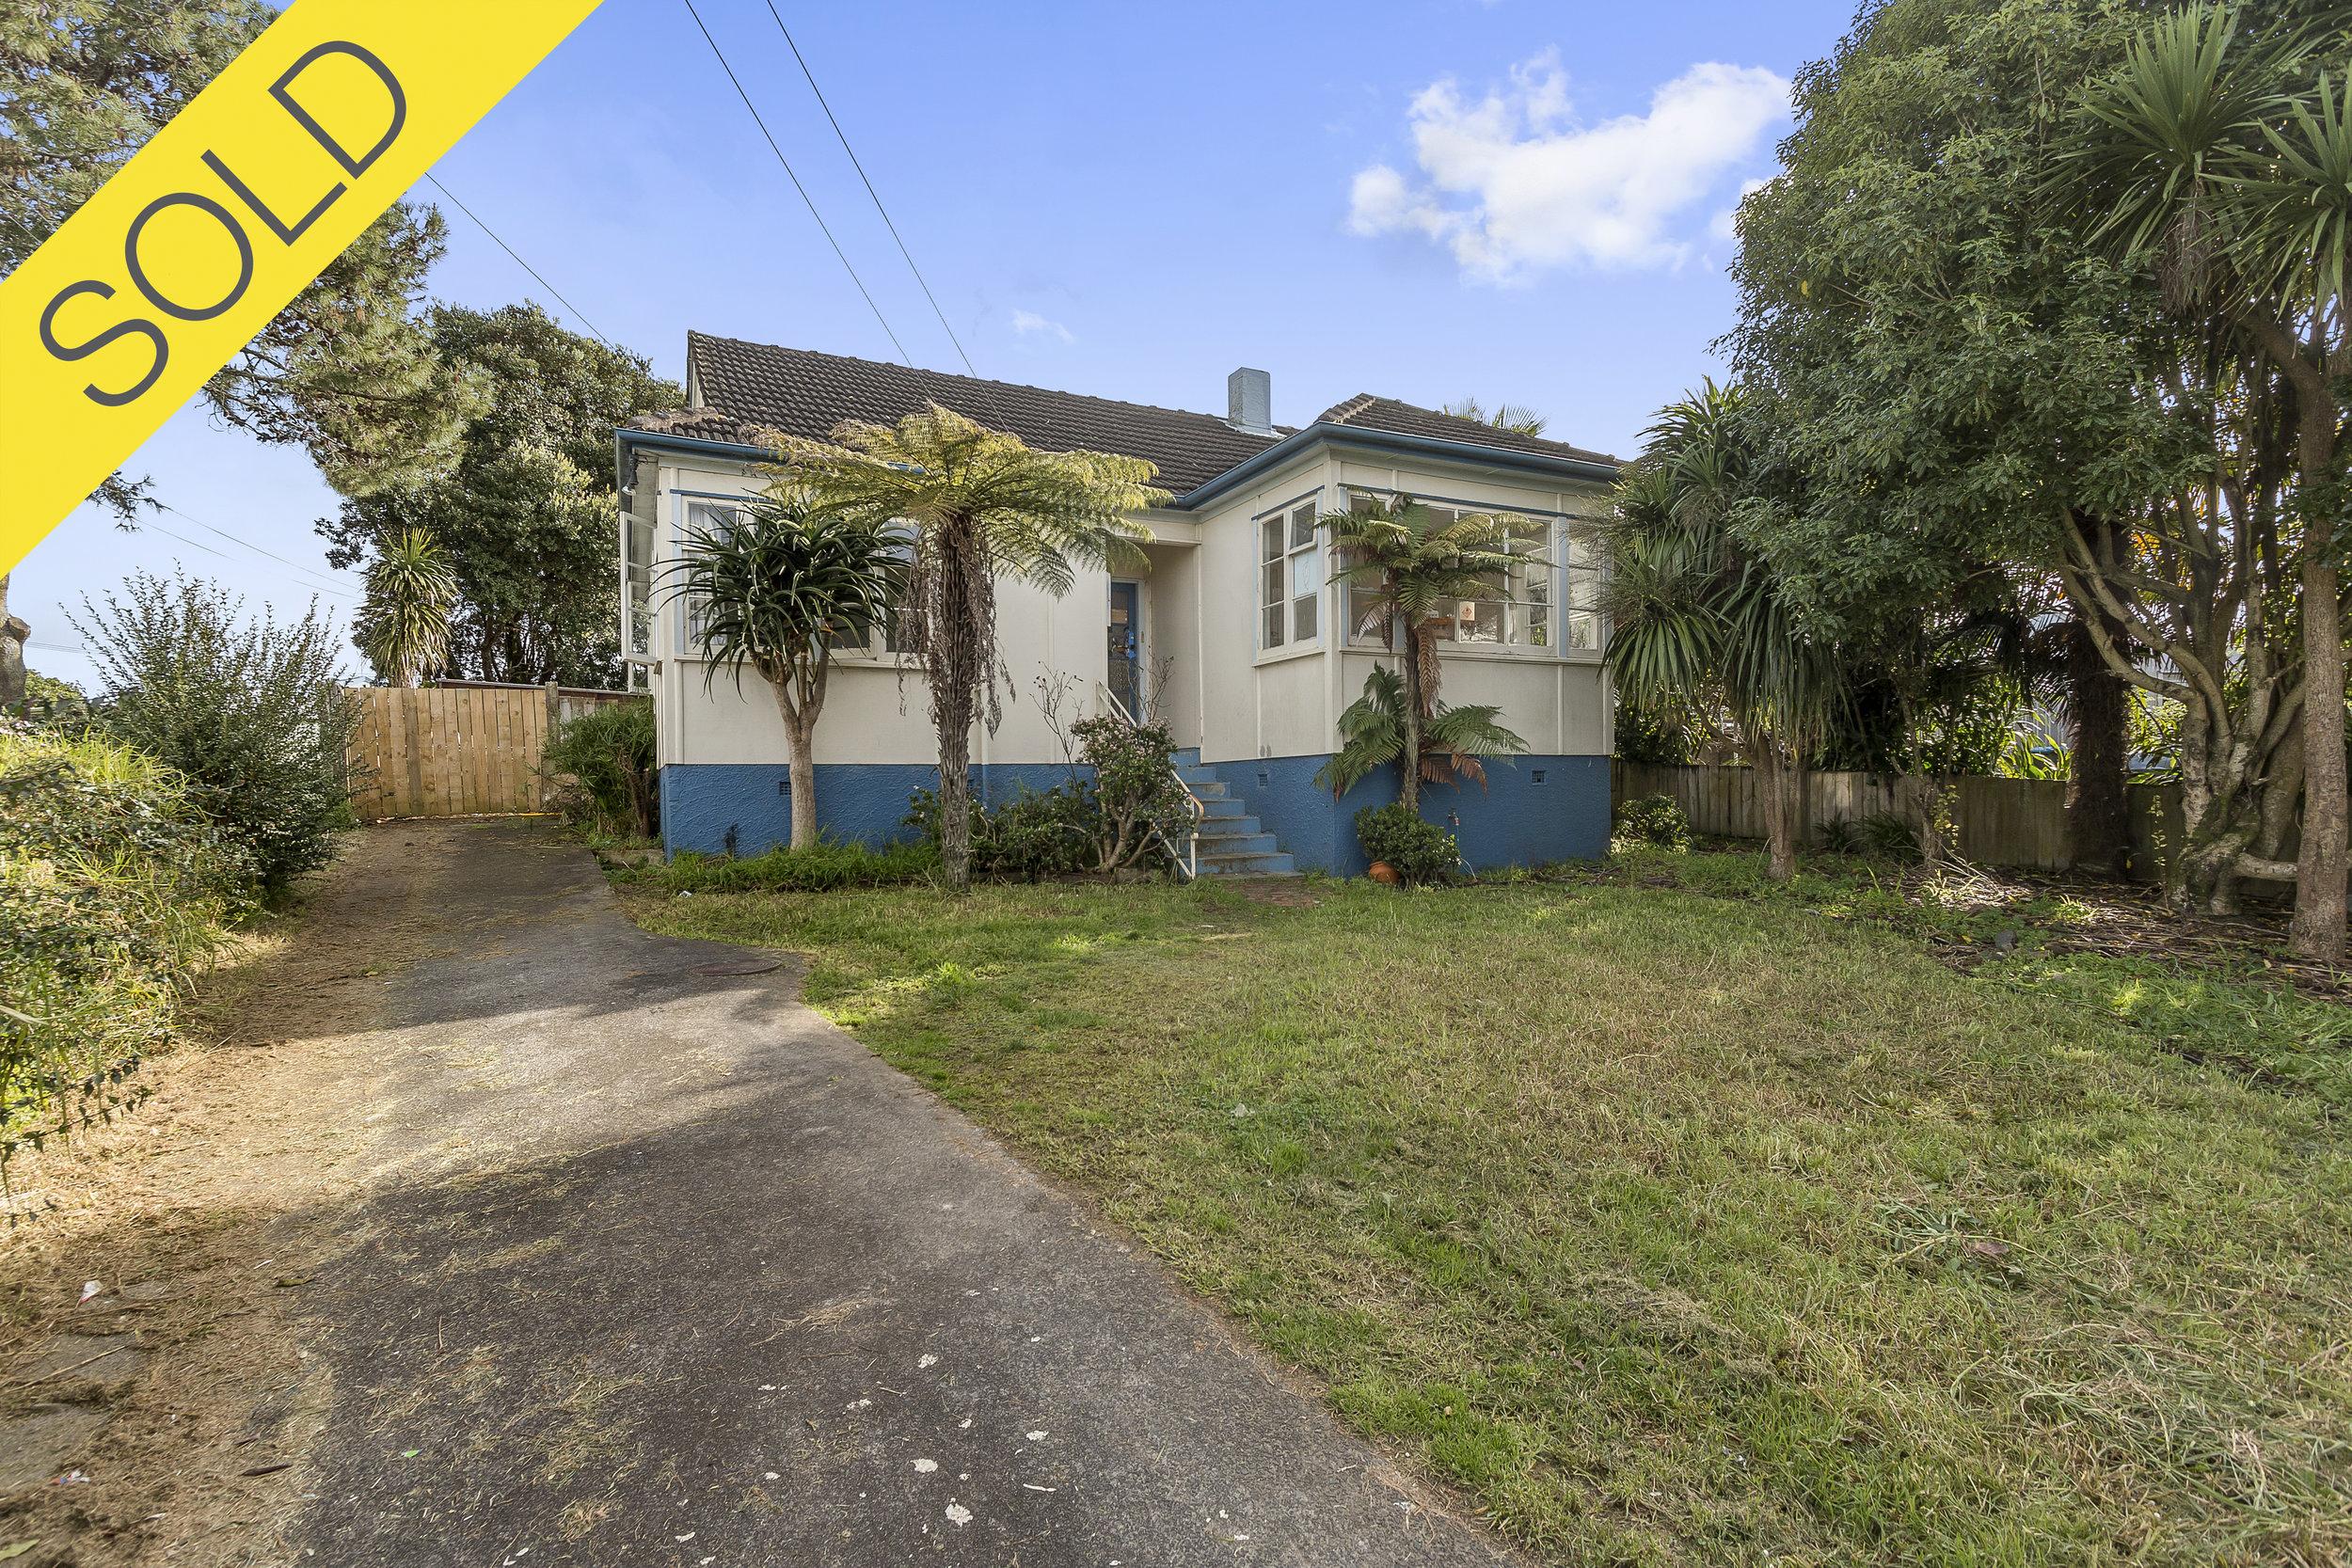 22 Glenarm Avenue, Mt Roskill, Auckland - SOLD AUGUST 20173 Beds I 1 Bath I 4 Parking